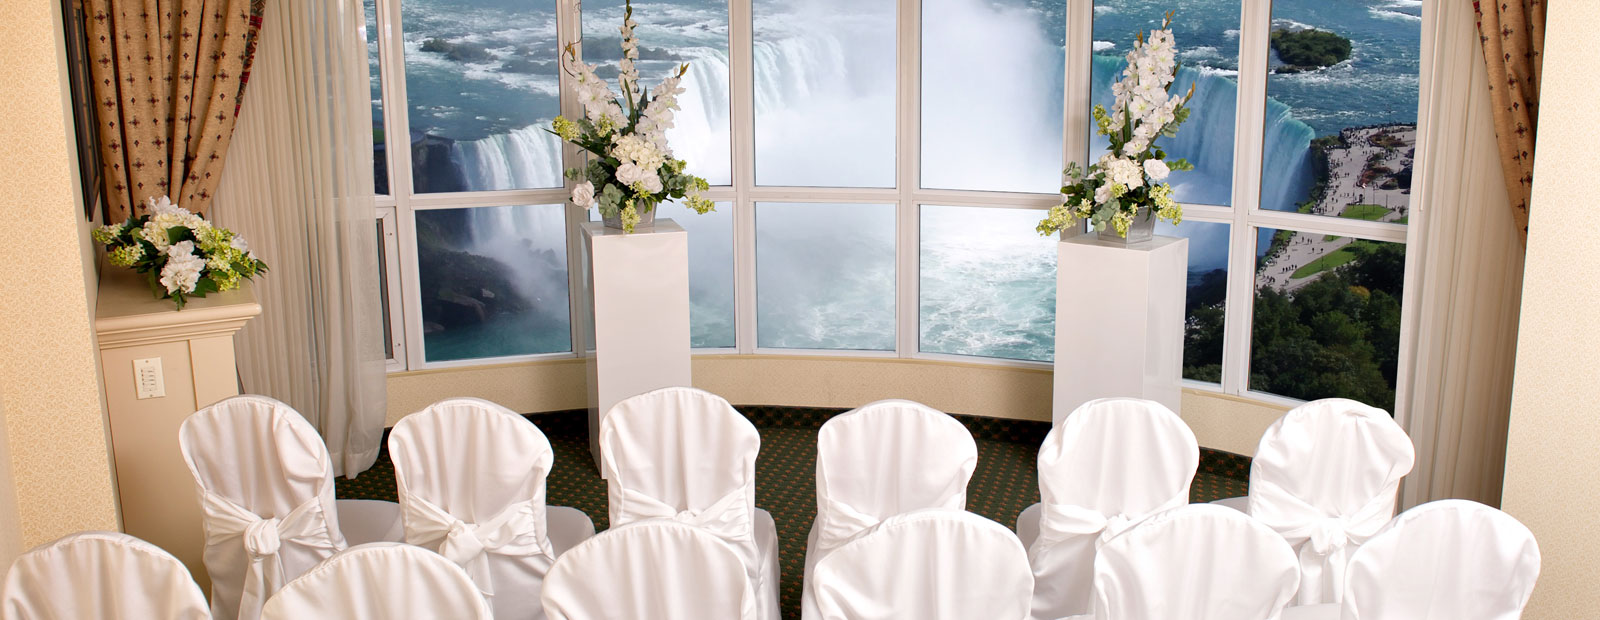 Embassy Suites by Hilton Niagara Falls - Fallsview Hotel, Canada